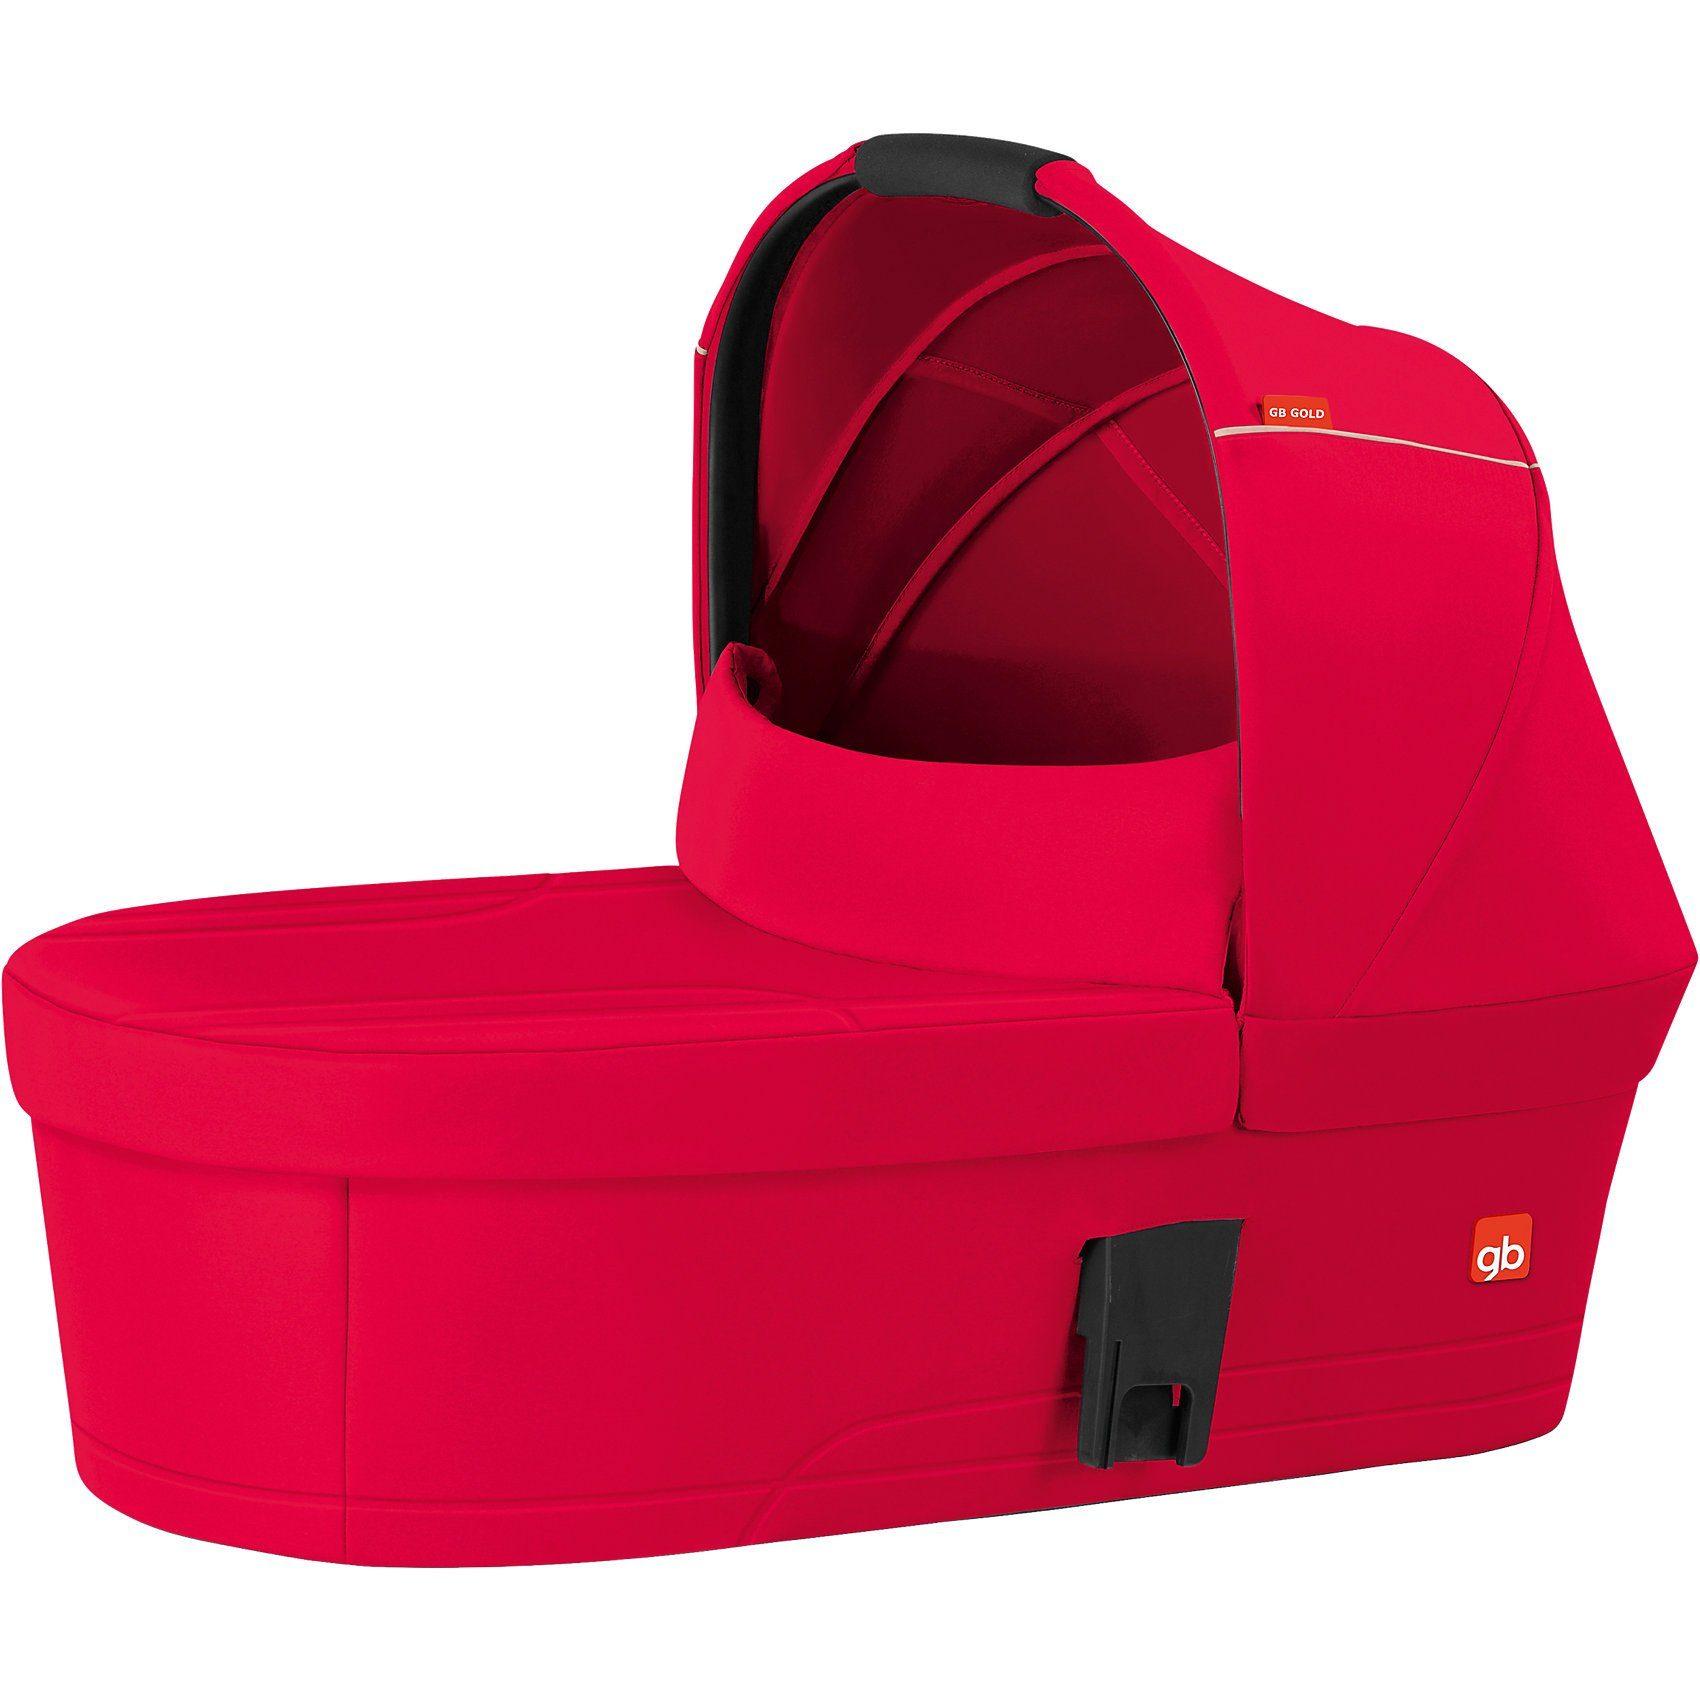 Goodbaby Kinderwagenaufsatz, Cherry Red-Red, 2018